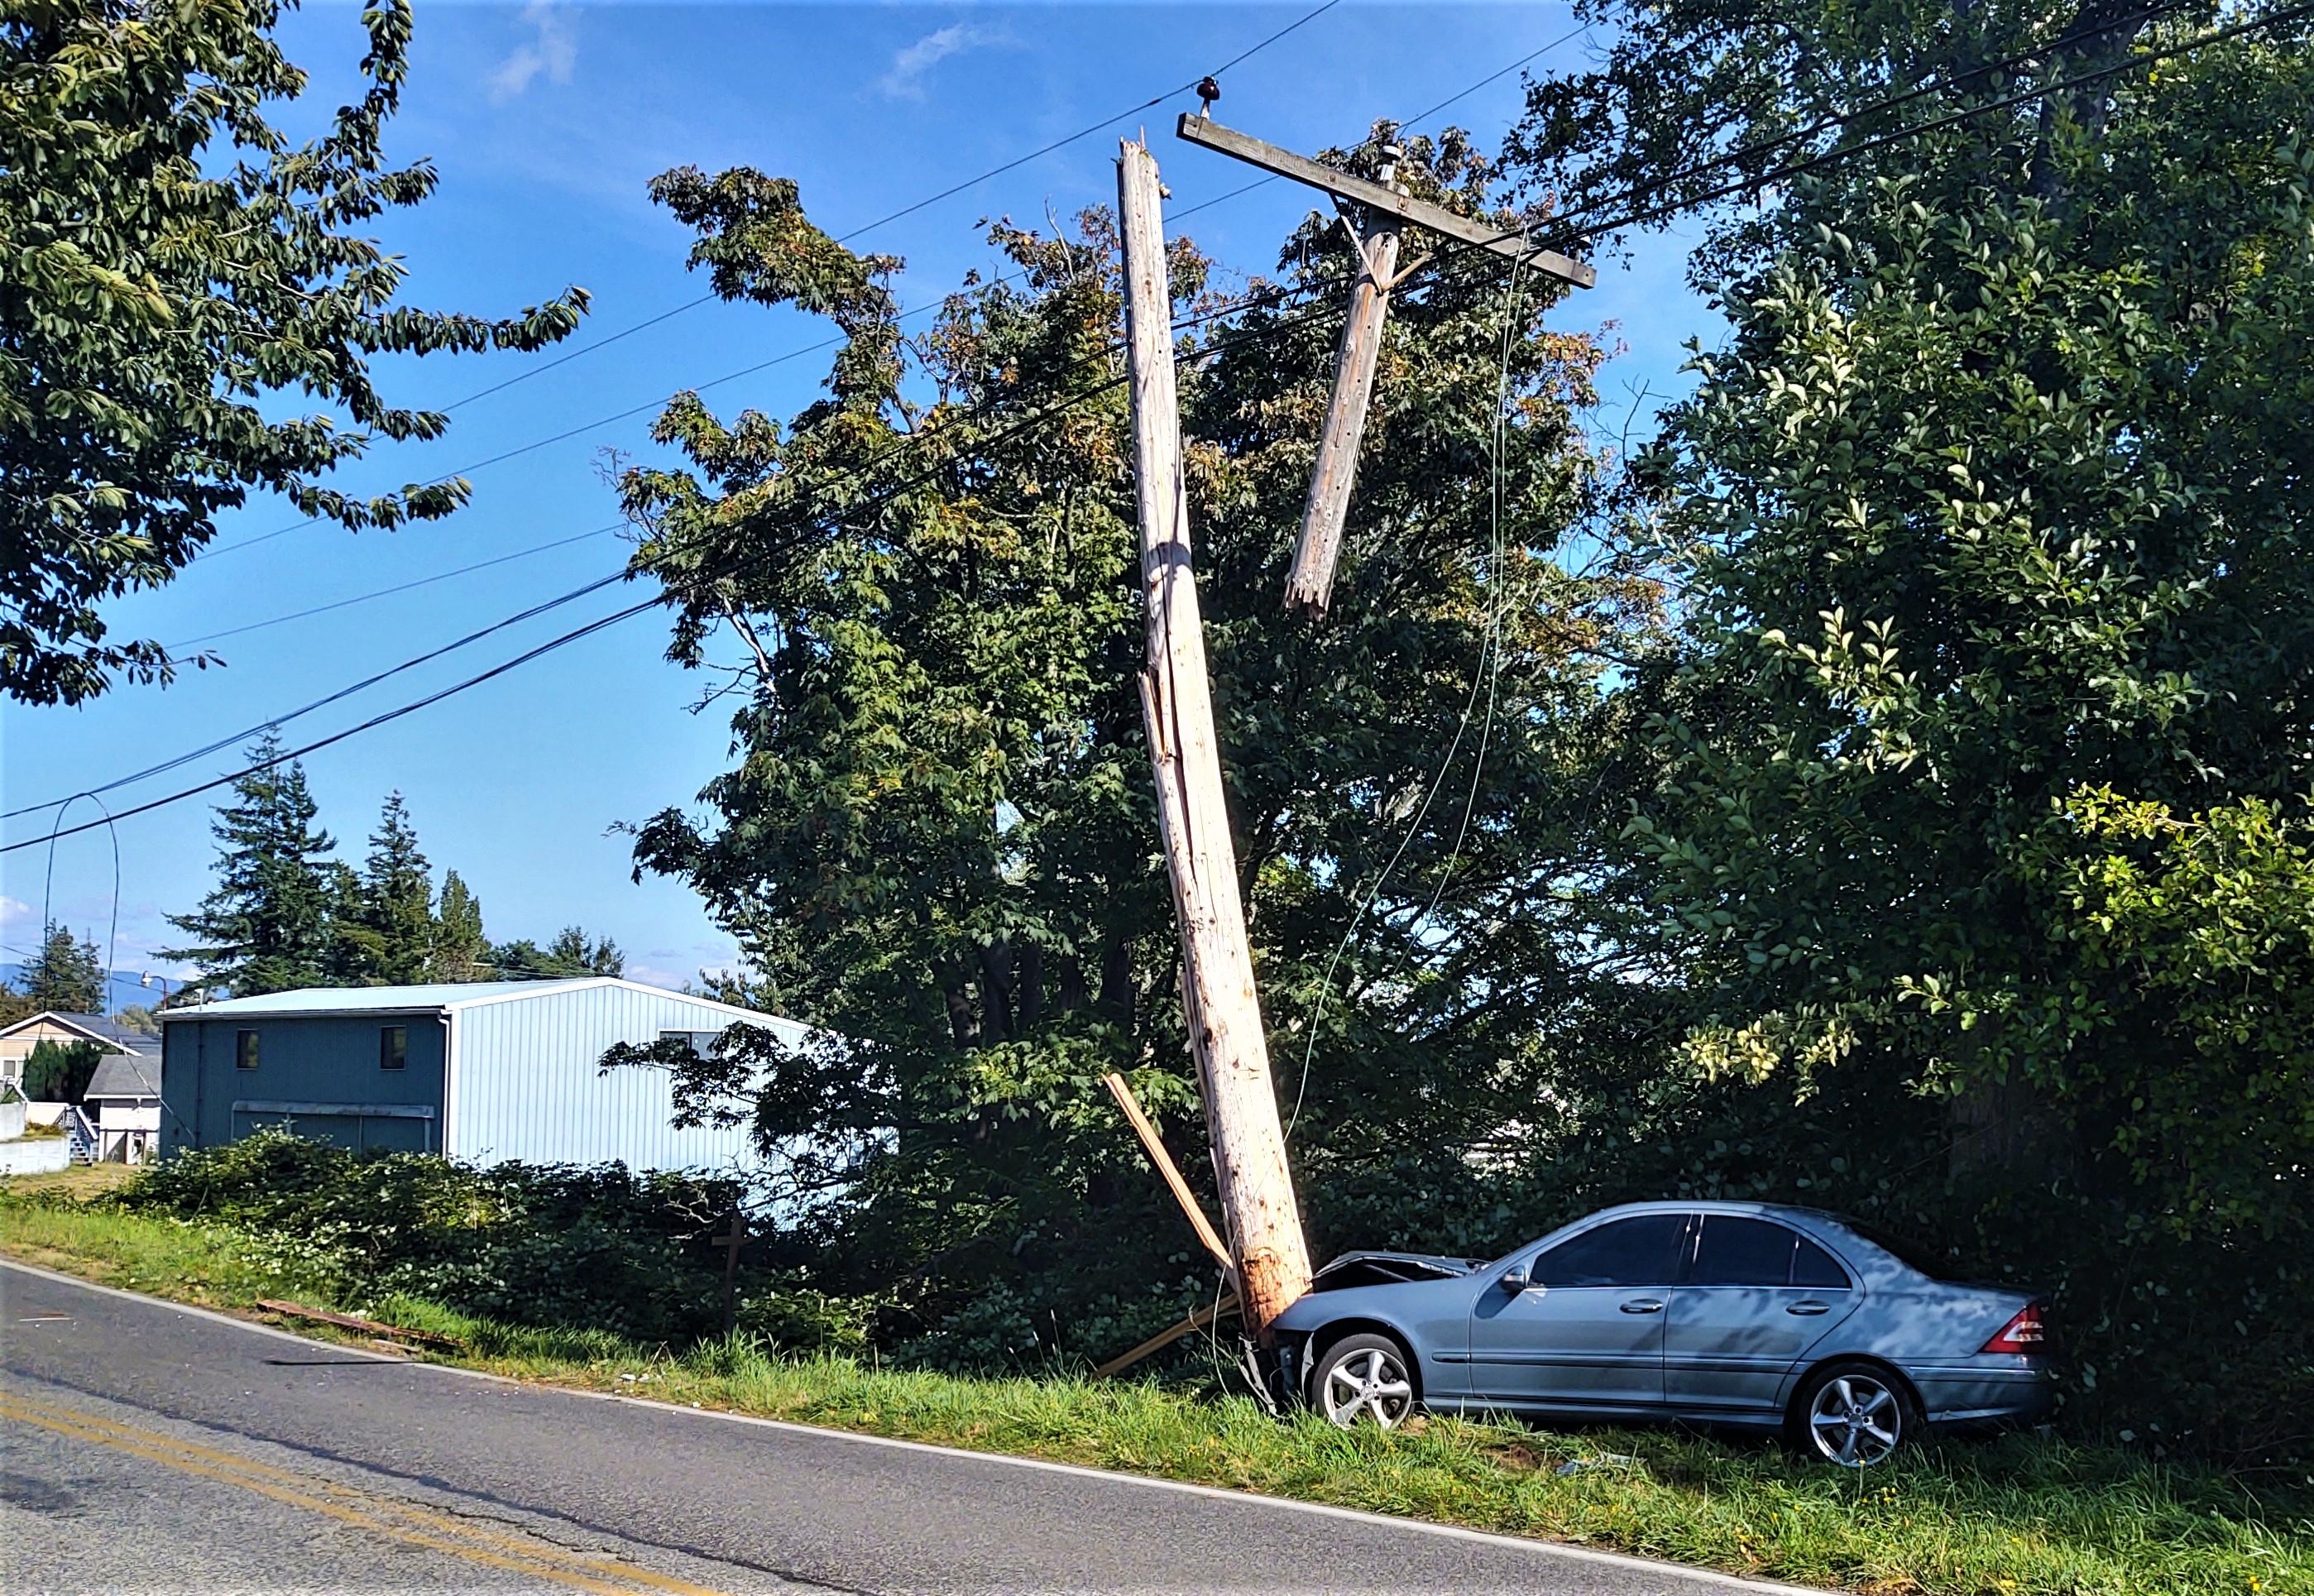 Scene of car vs pole crash on Douglas Road (August 29, 2020). Photo: My Ferndale News